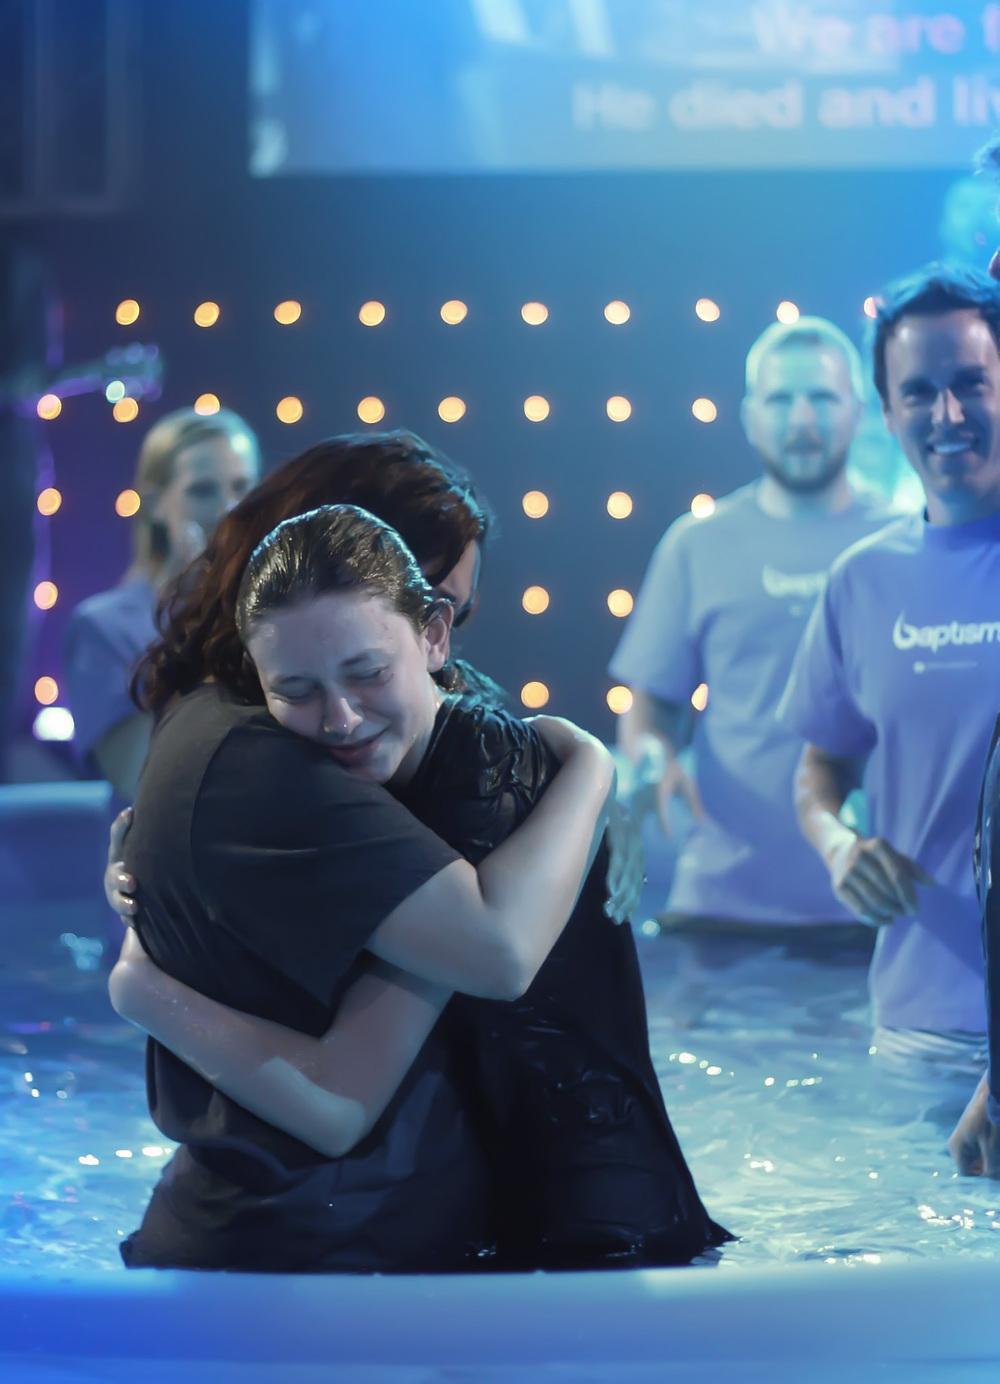 Oonagh baptism1.jpg